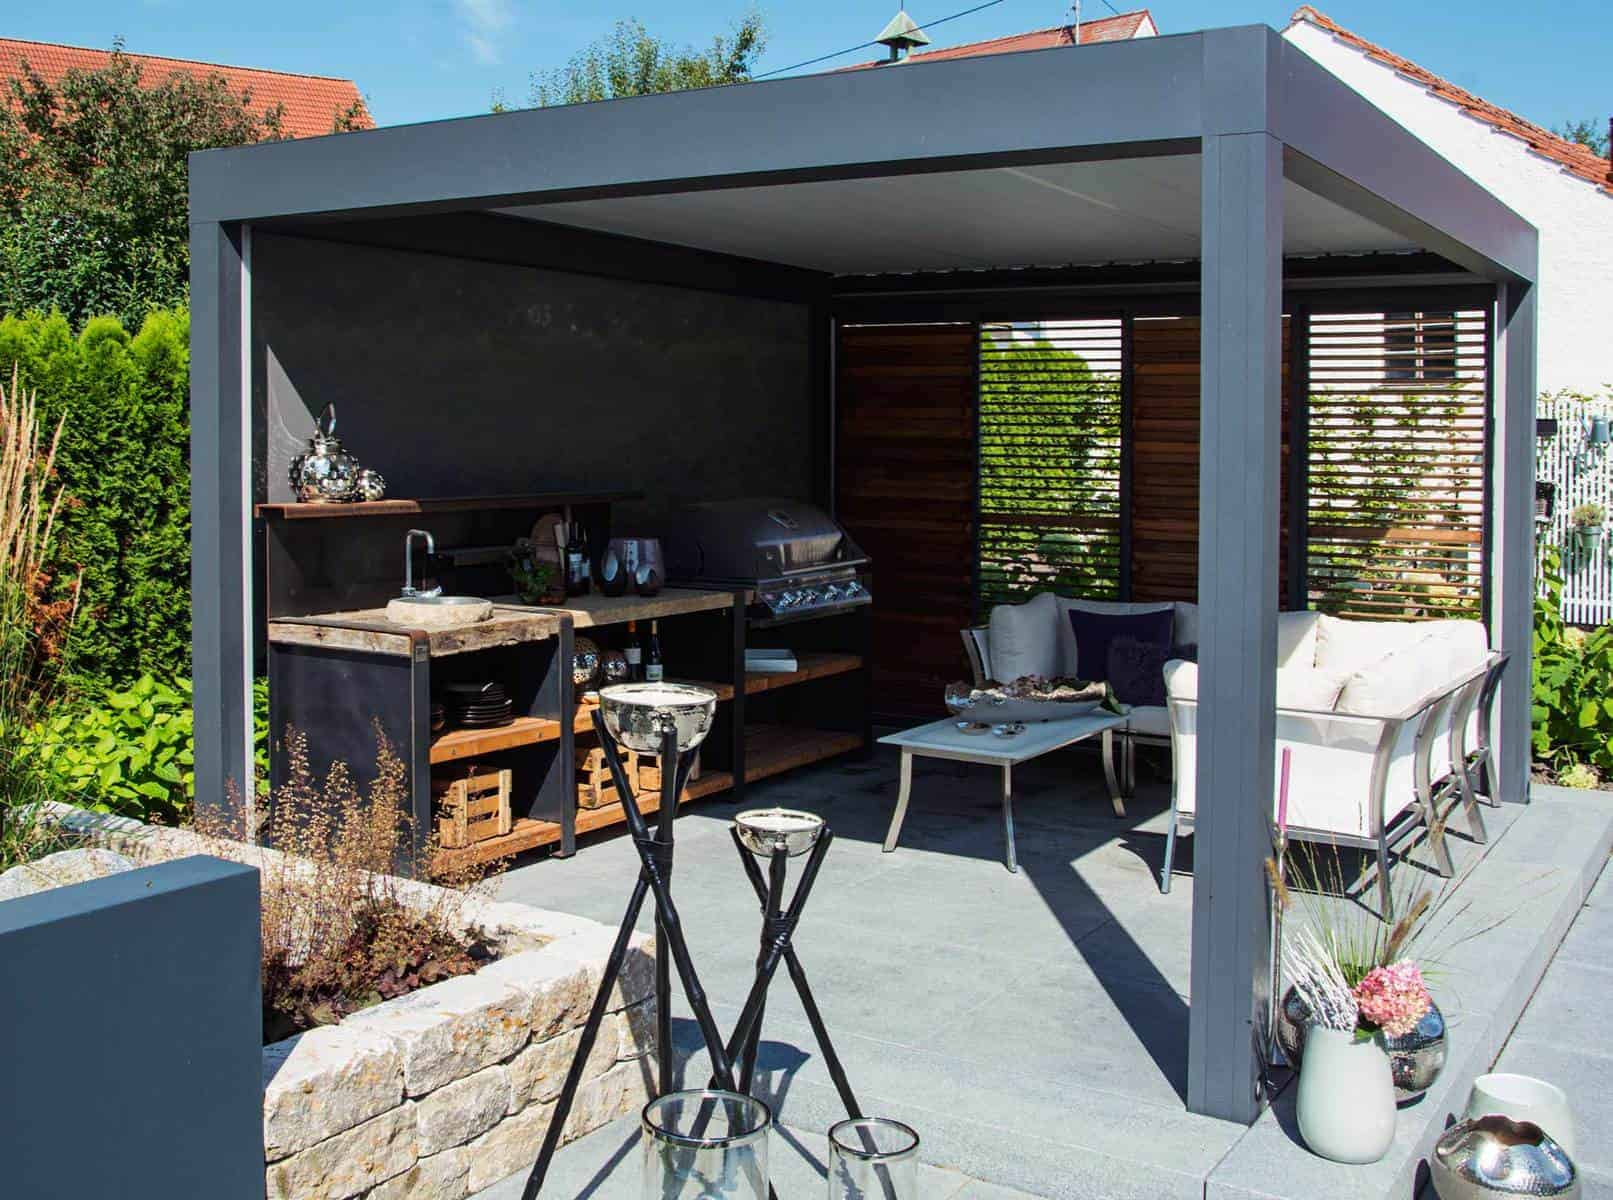 Outdoor Küche Utensilien : Outdoorküche immobil mobil und modular